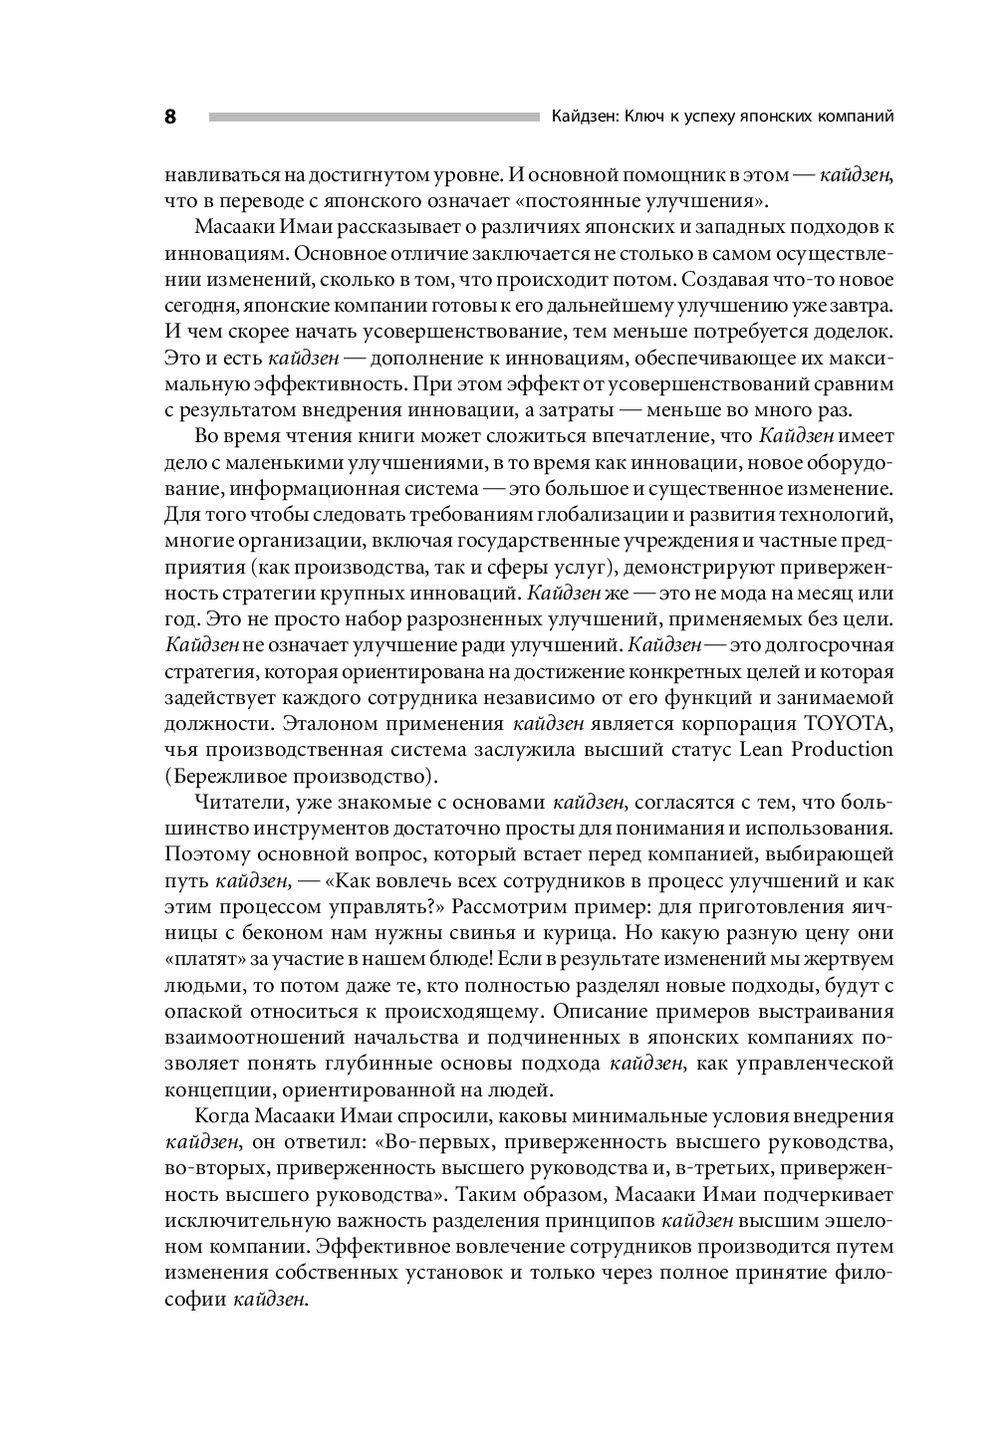 Ваш Огород Сад Электронная Энциклопедия 1 8 Ключ